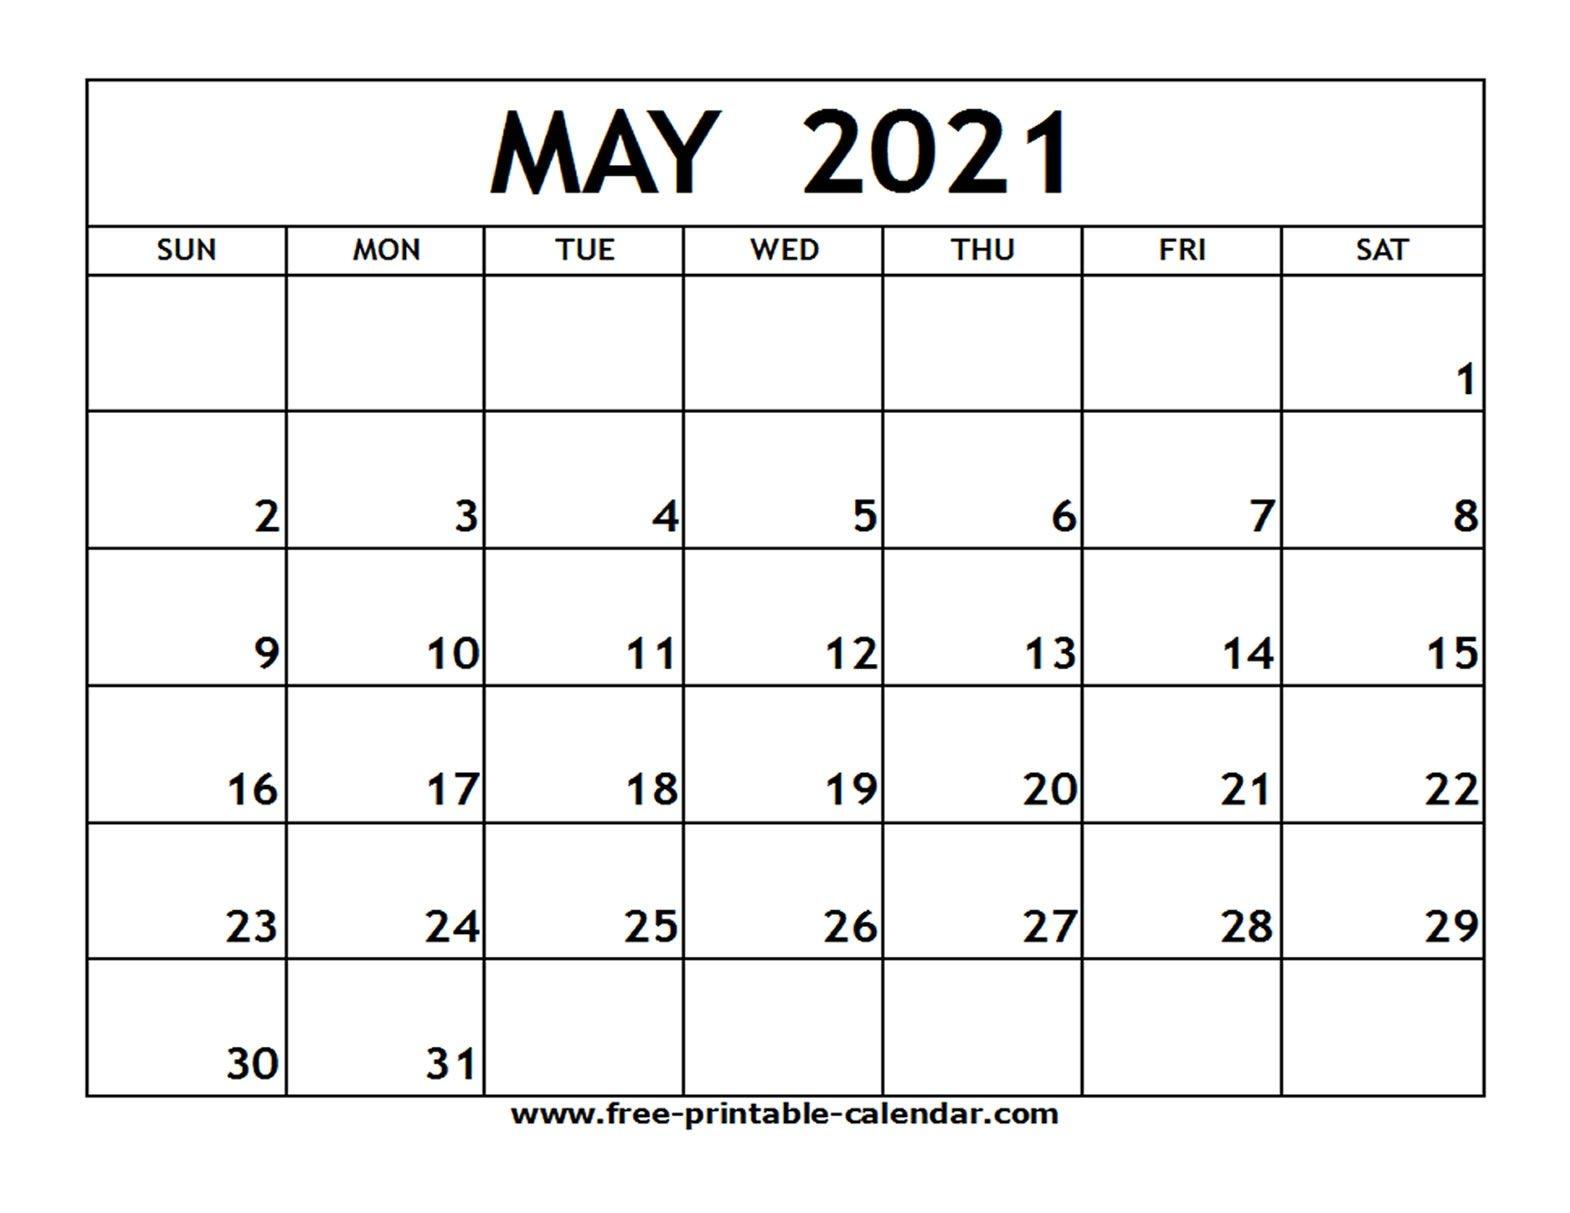 Printable May 2021 Calendar Source | 2021 Calendar